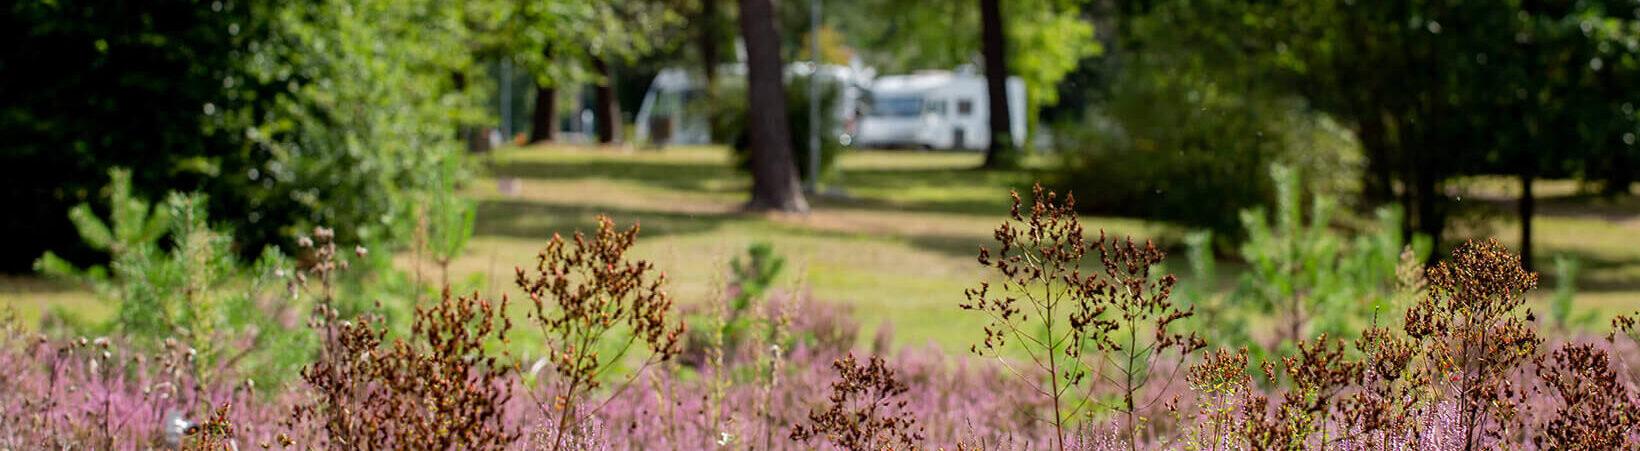 Naturcamping Lüneburger Heide - Campingplatz